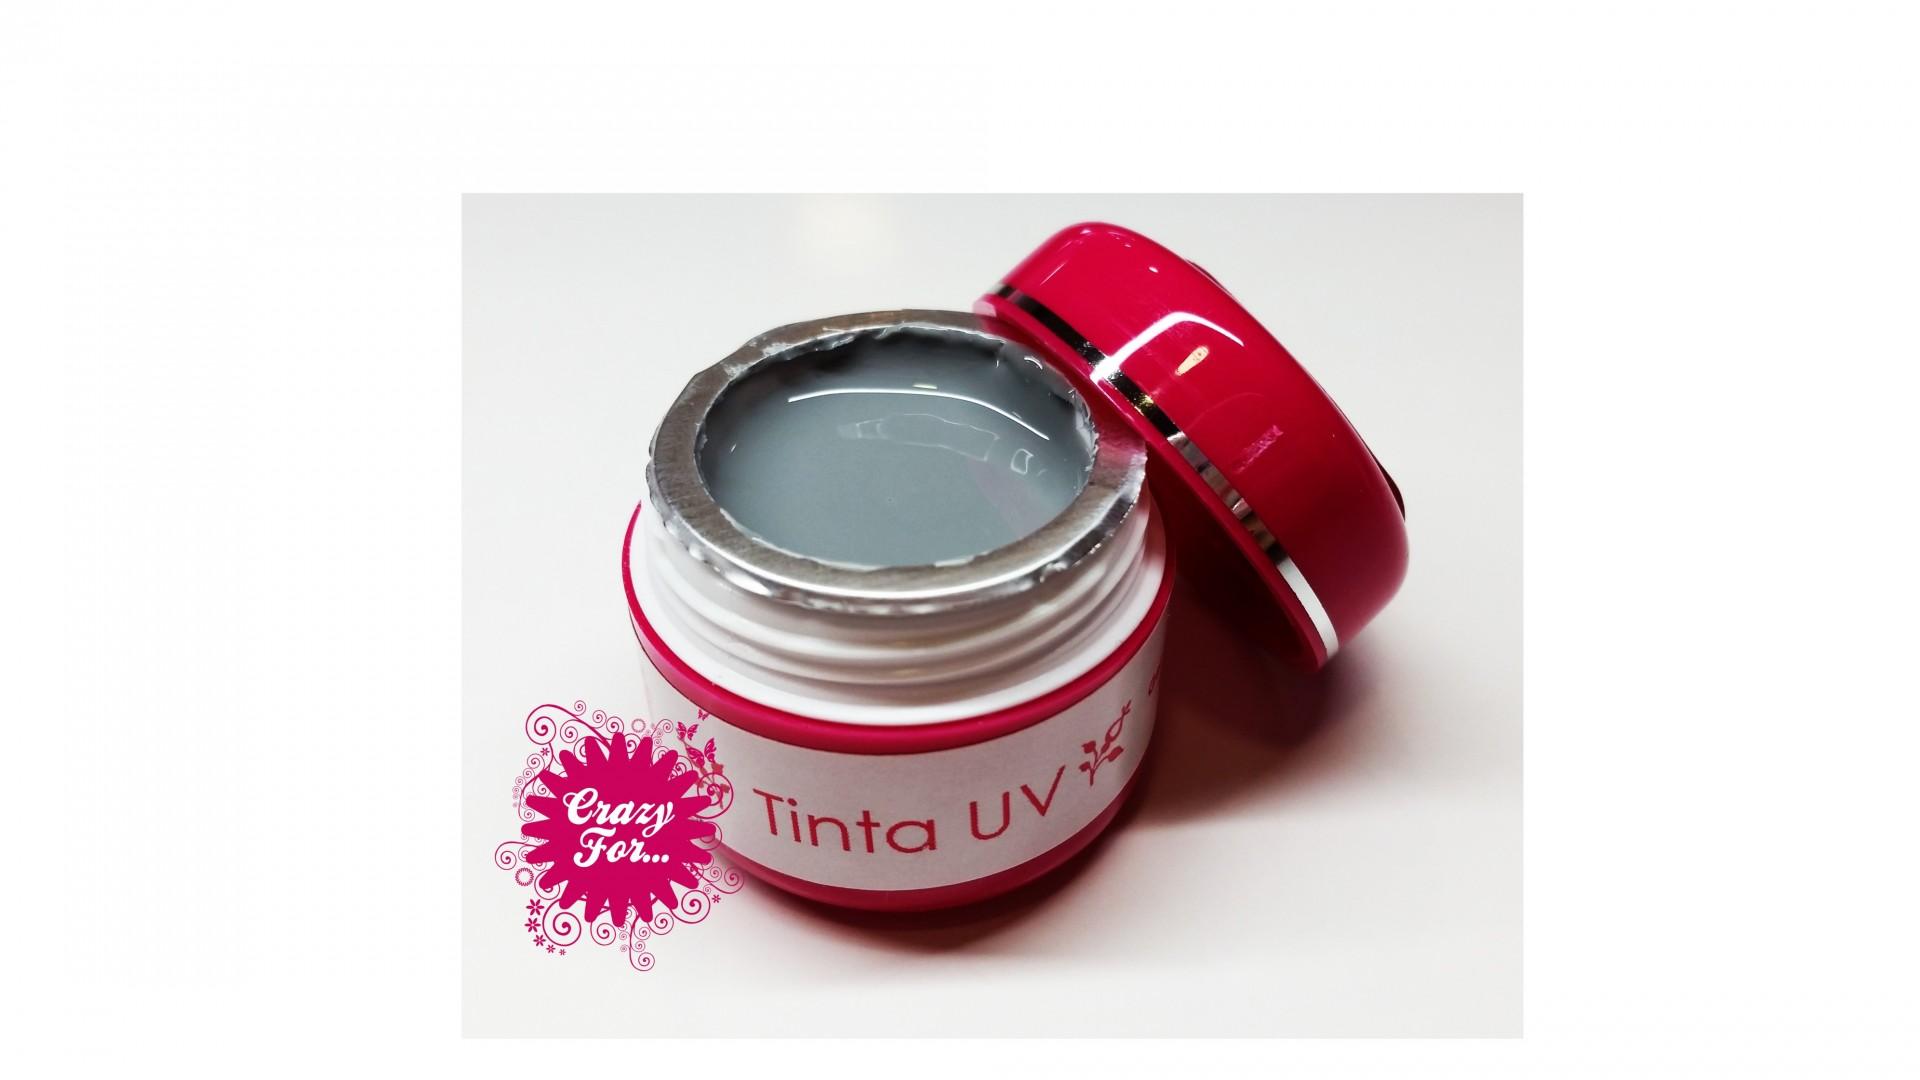 Tinta UV nº20 - Cinzento